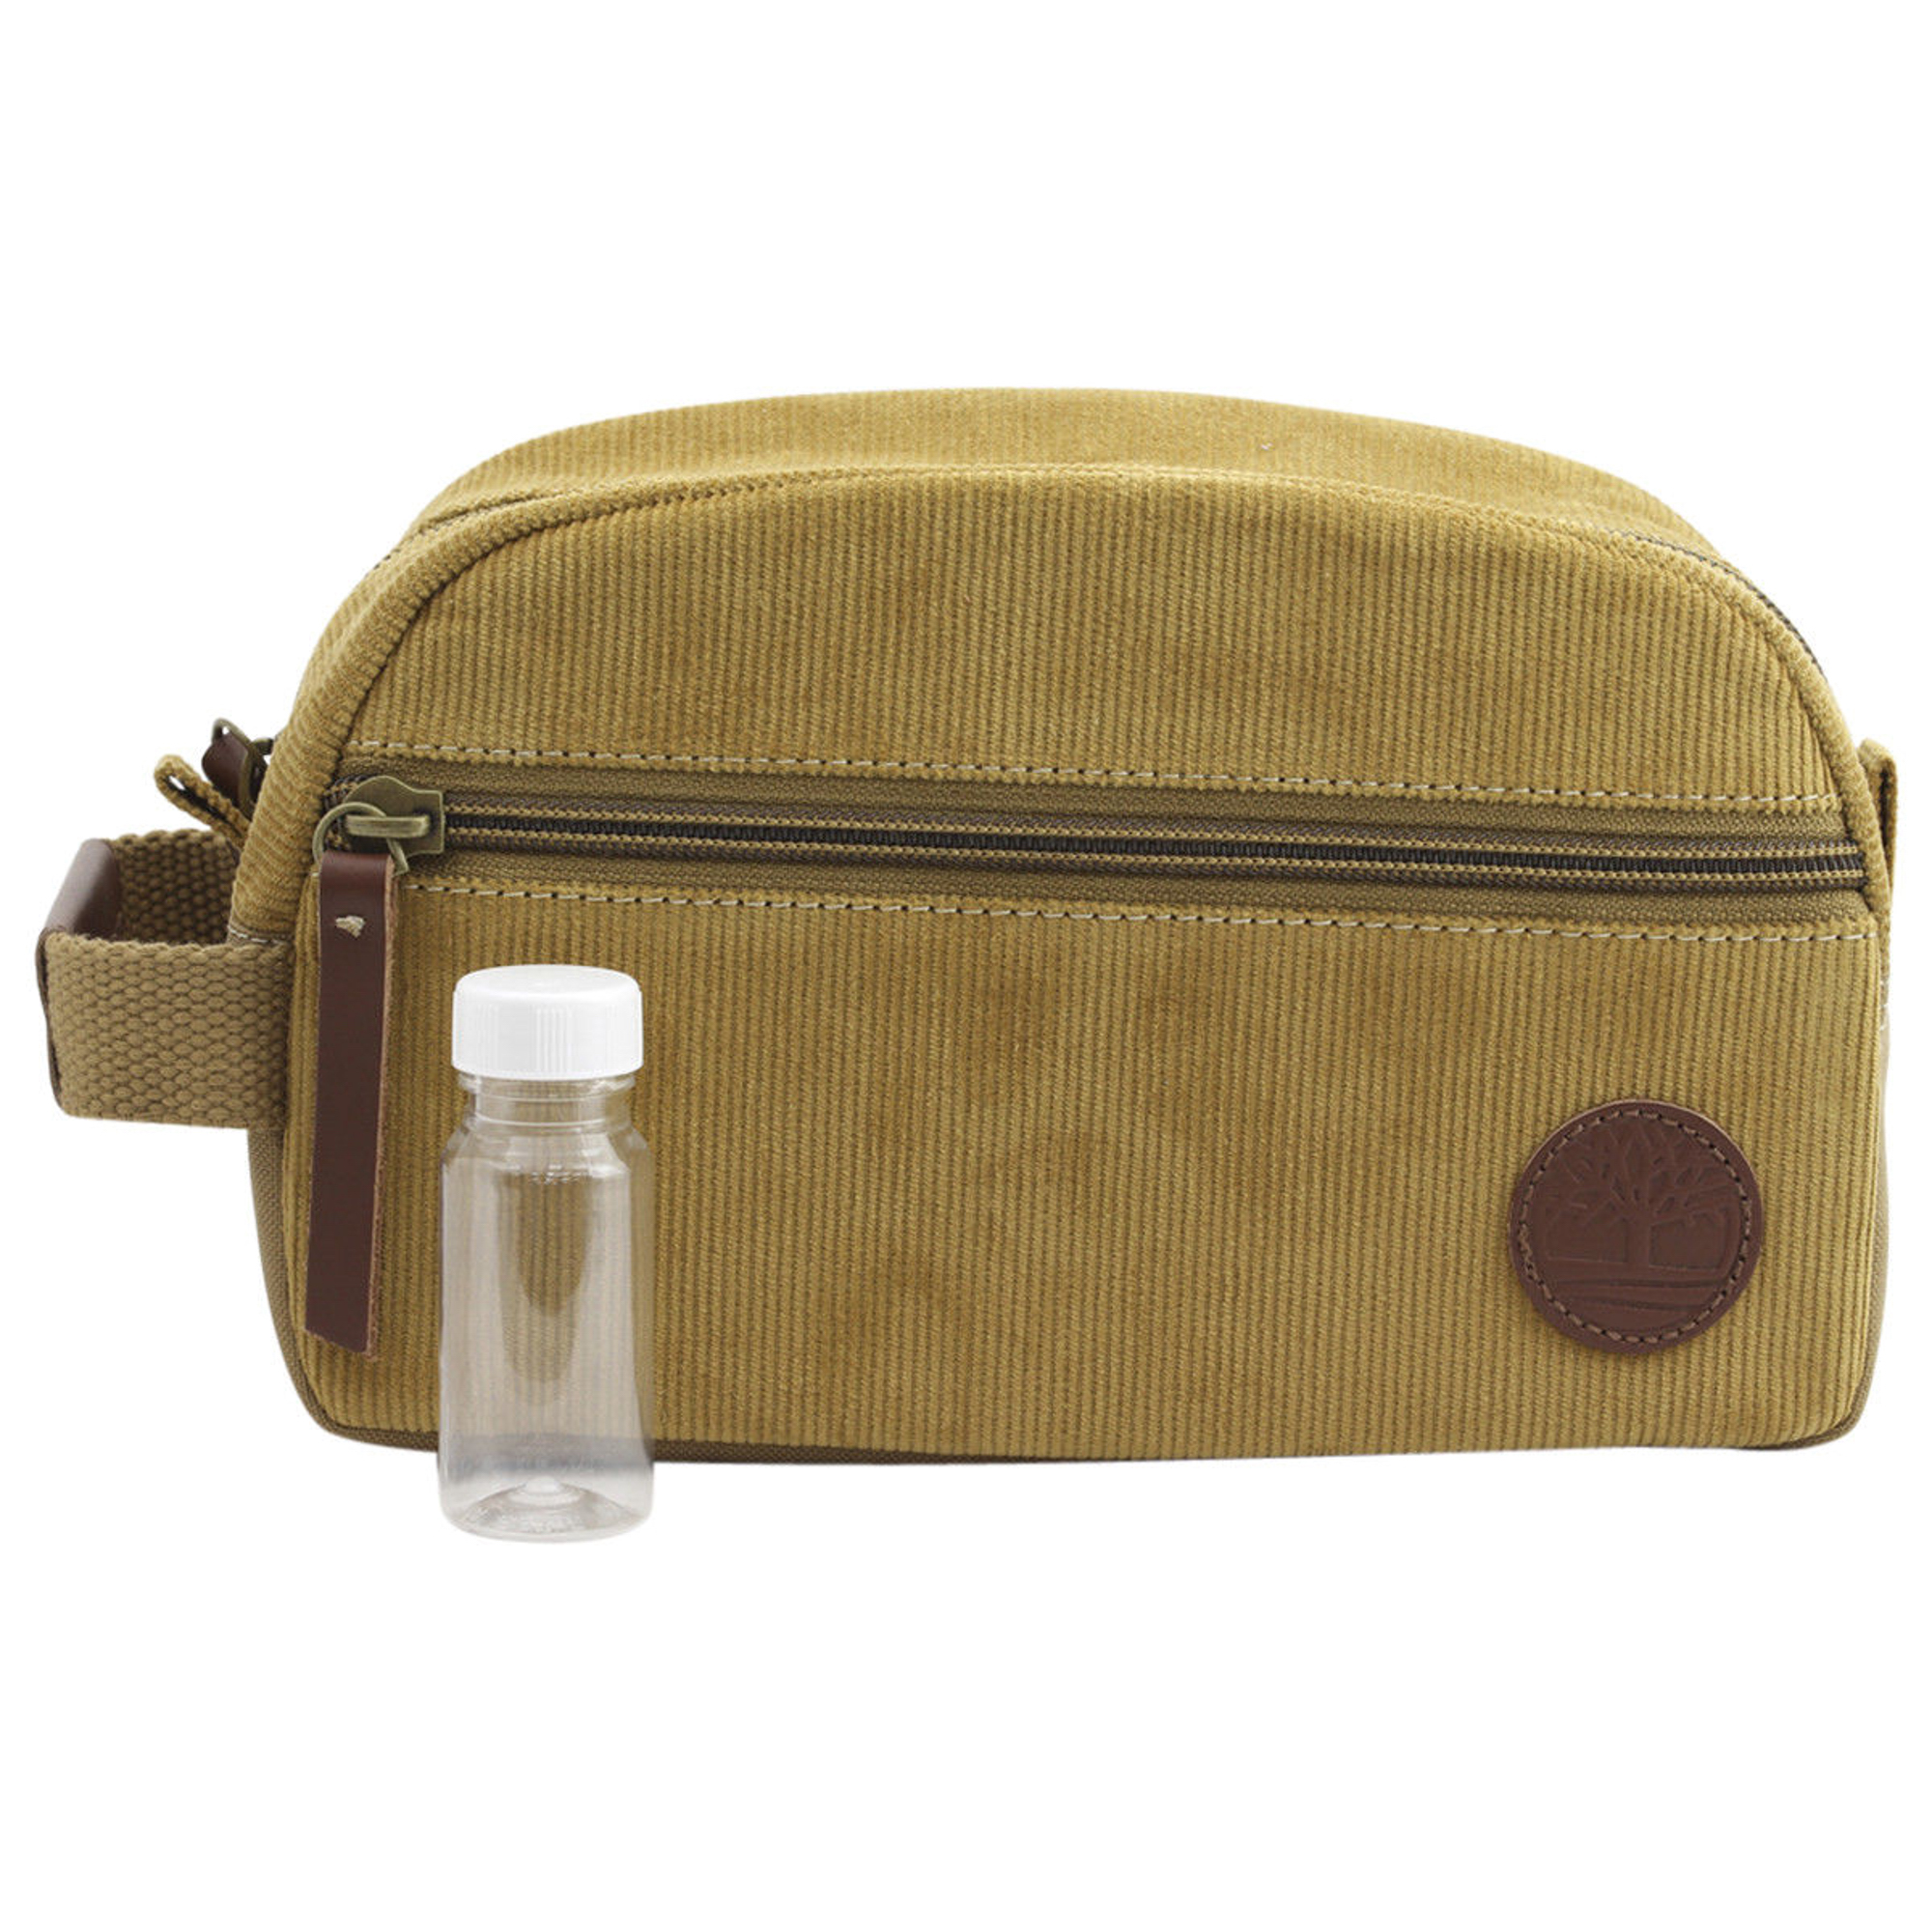 23ab8d0284 Timberland Mens Shave Kit Organizer Travel Dopp Kit Overnight Toiletry Bag